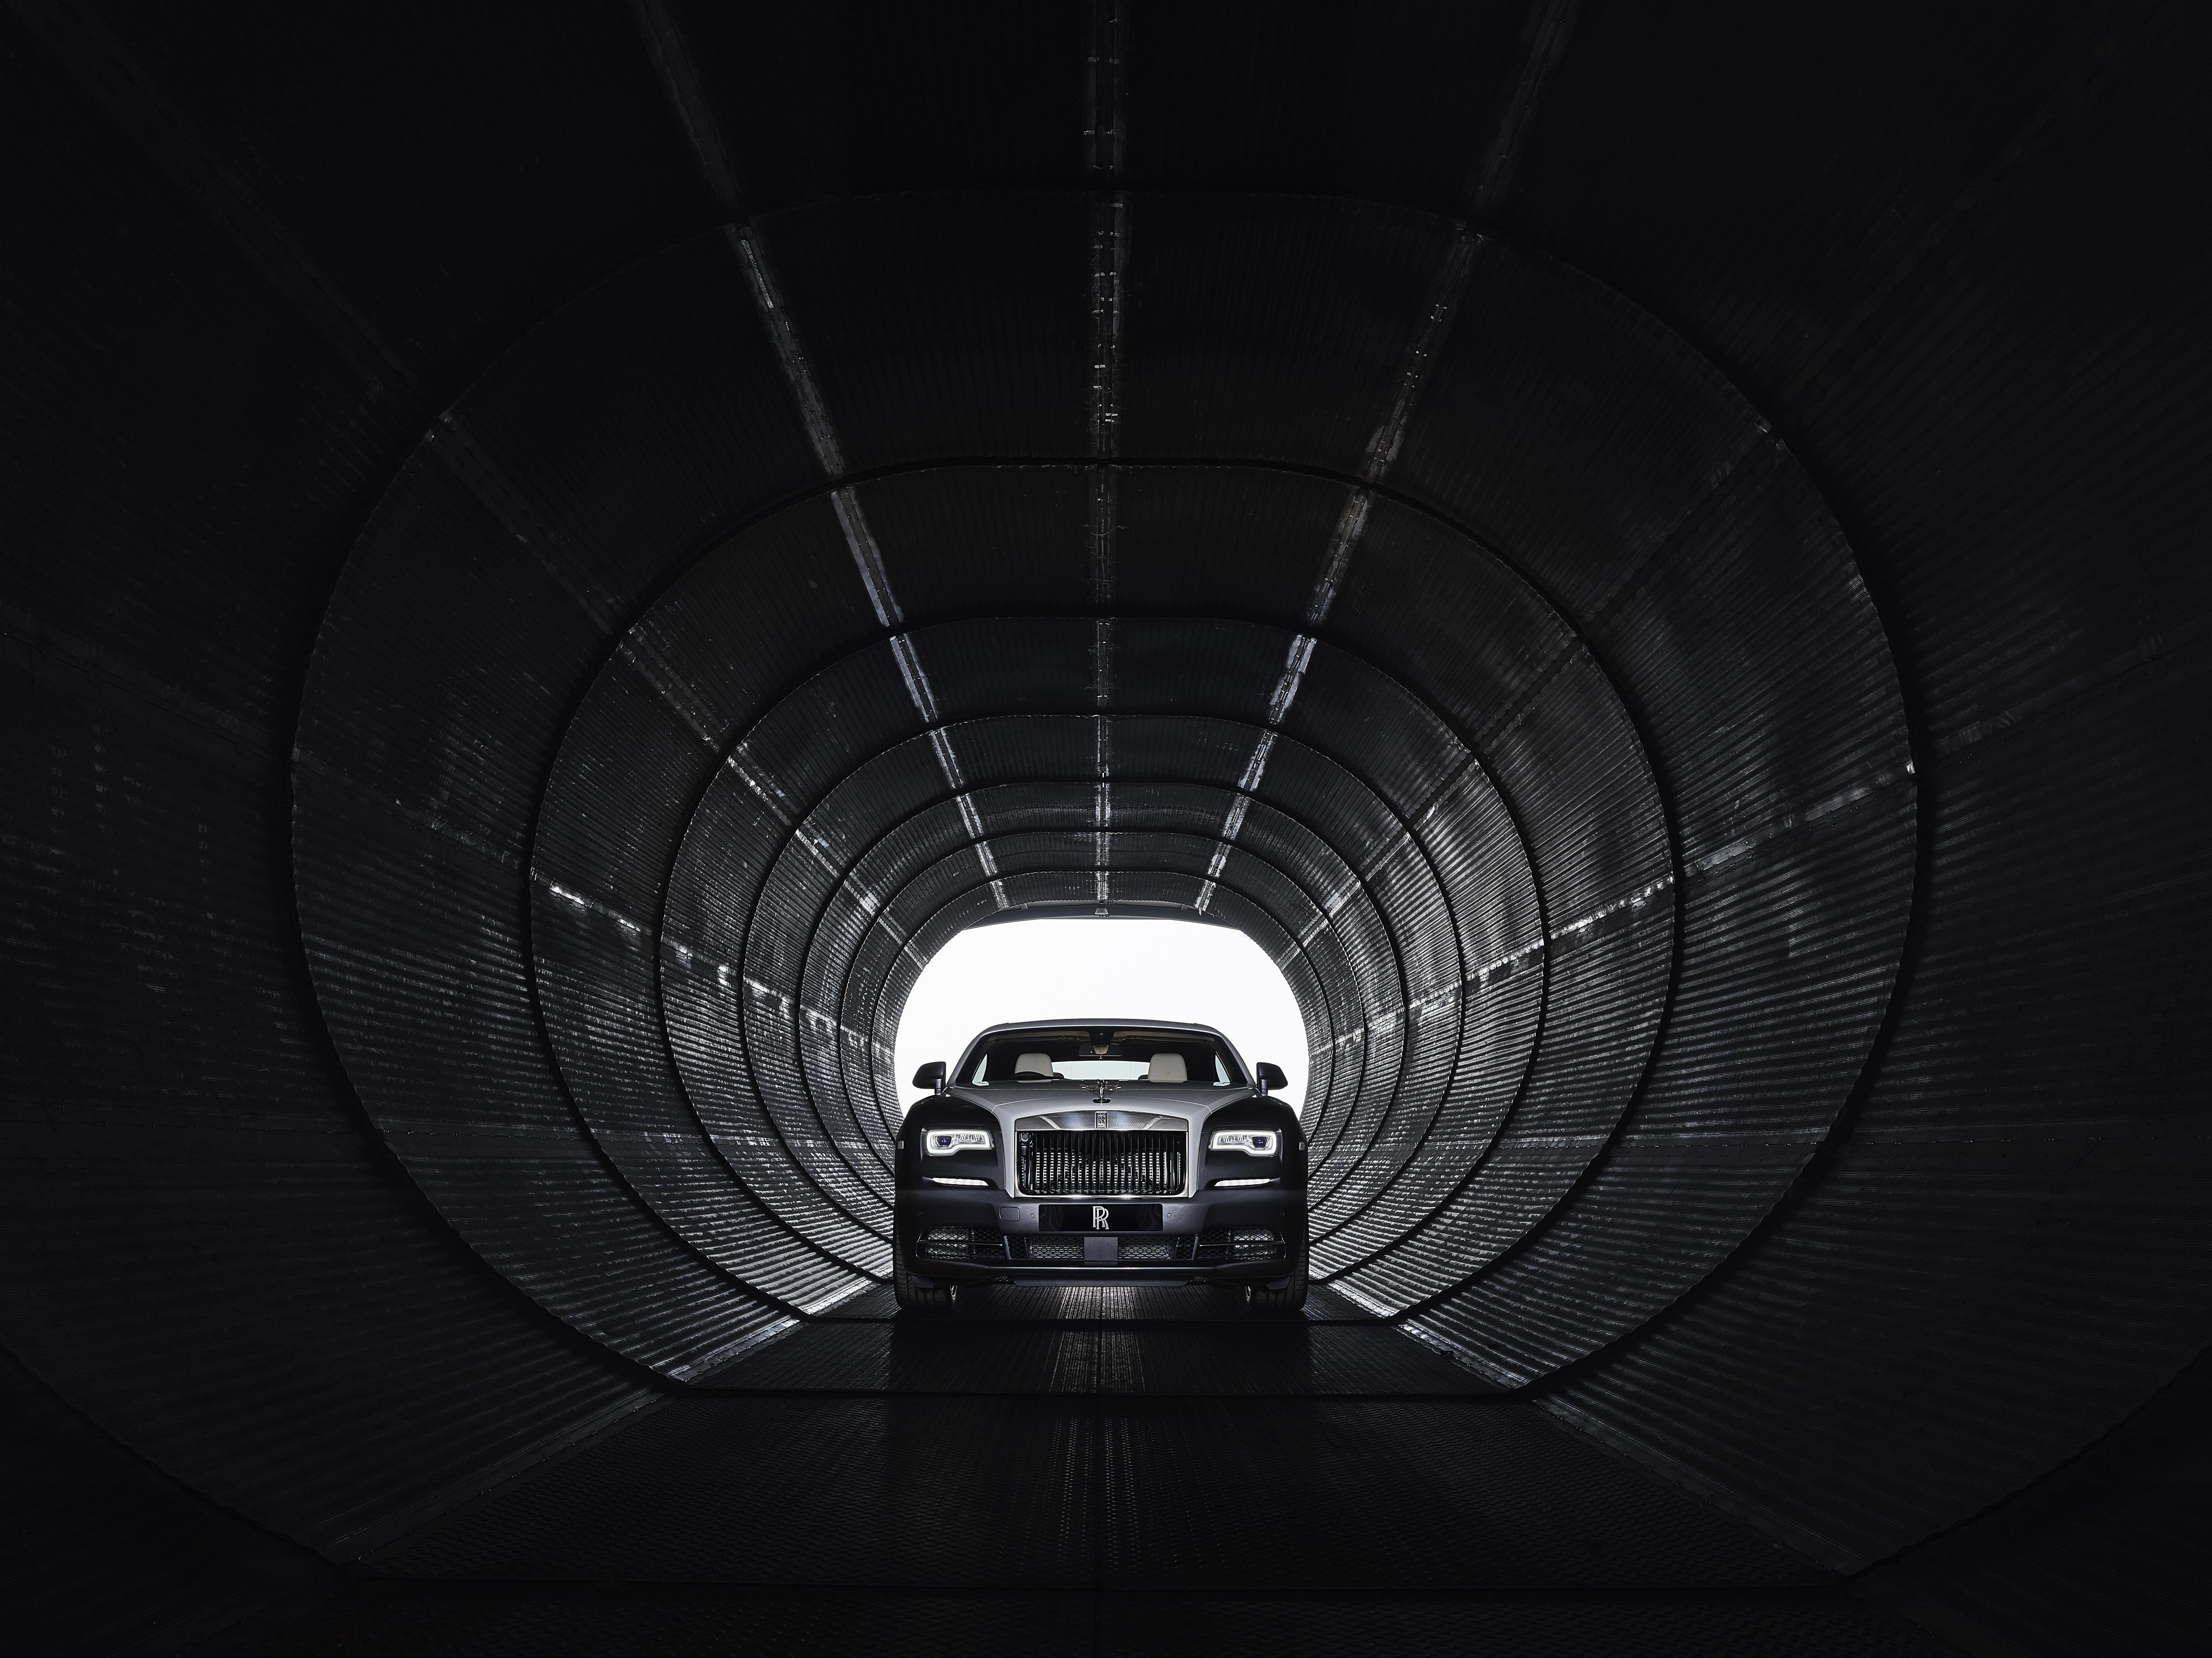 Rolls-Royce Wraith in Tunnel